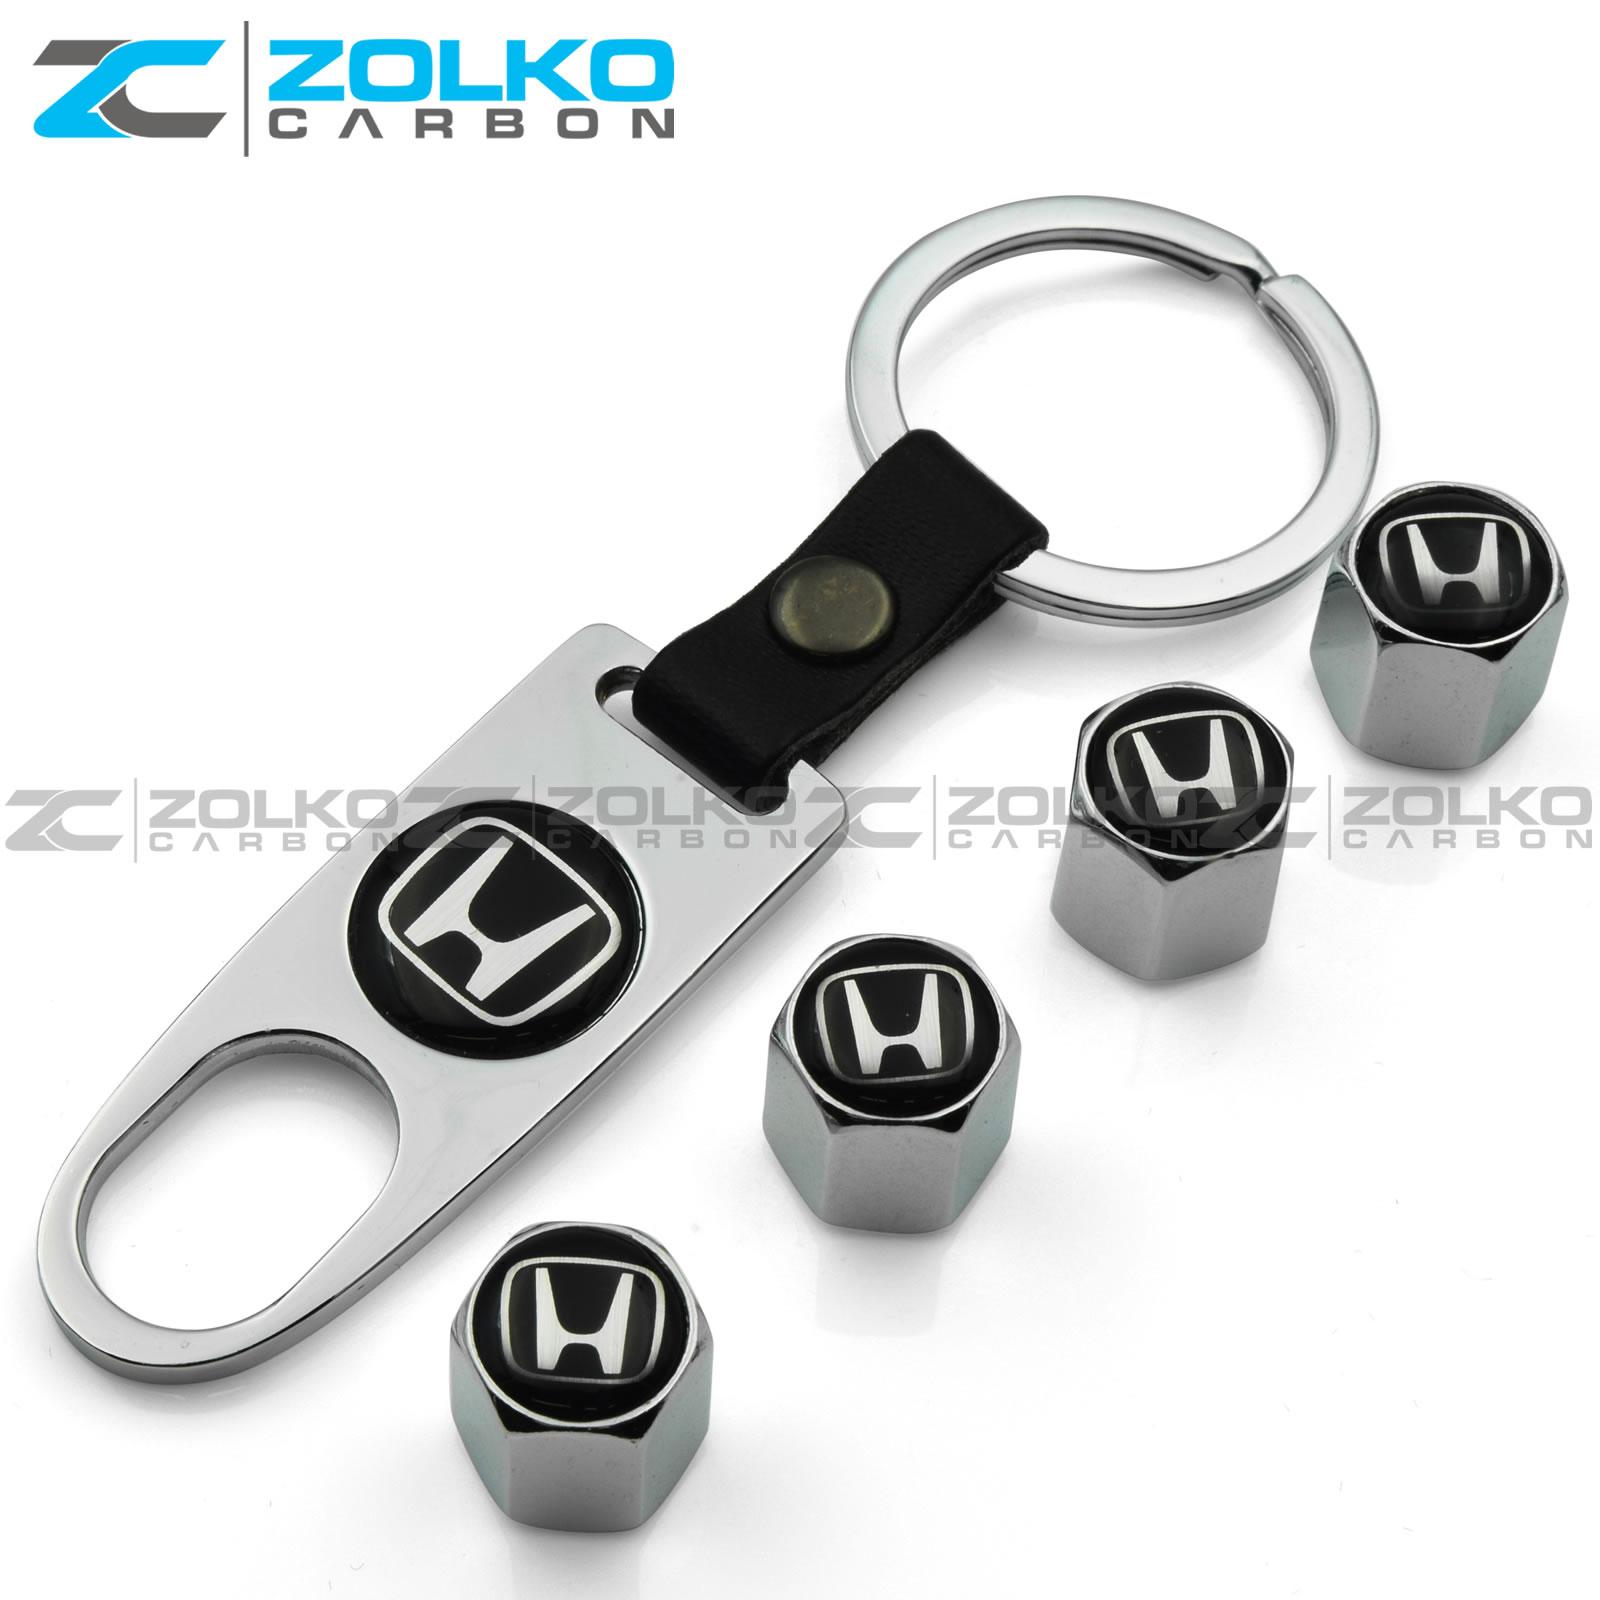 tyre valve dust caps Gift Honda High Quality Chrome keyring keychain fob